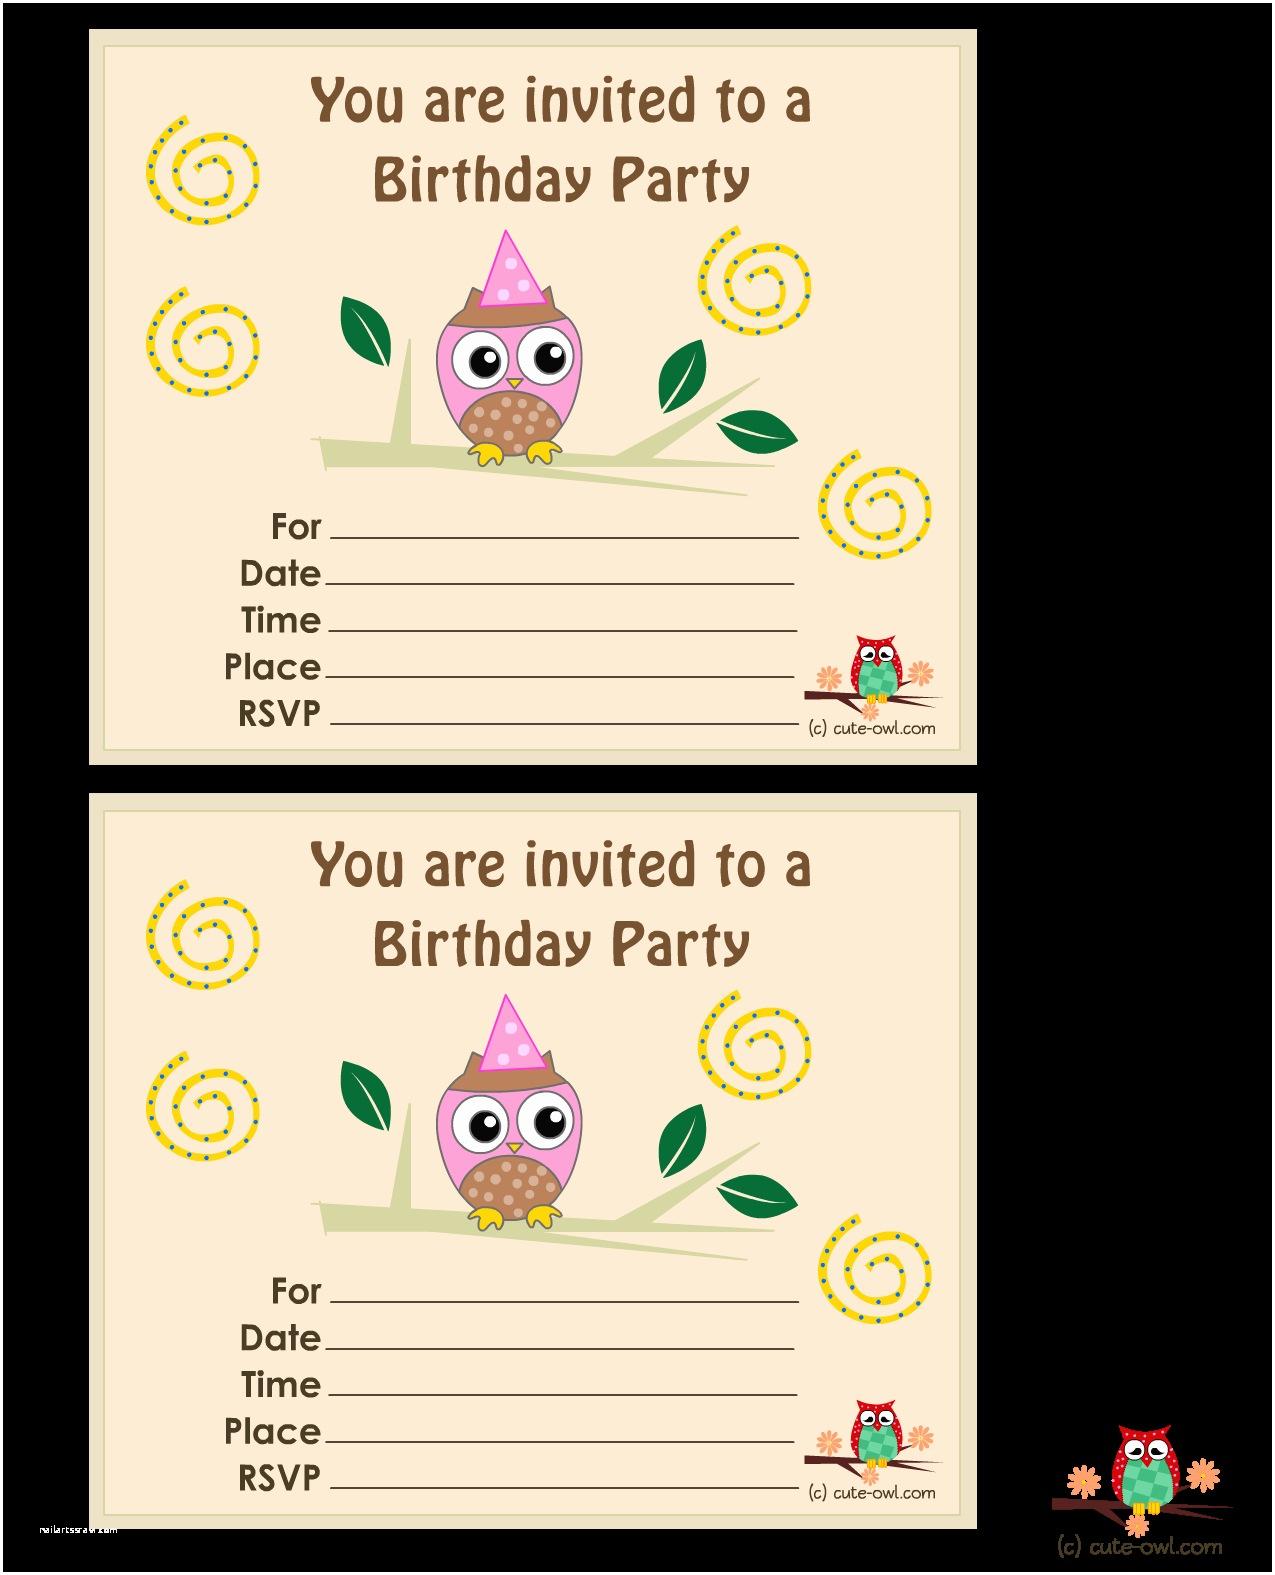 Birthday Party Invitations Free Free Printable Invitations for Boys Birthday Party